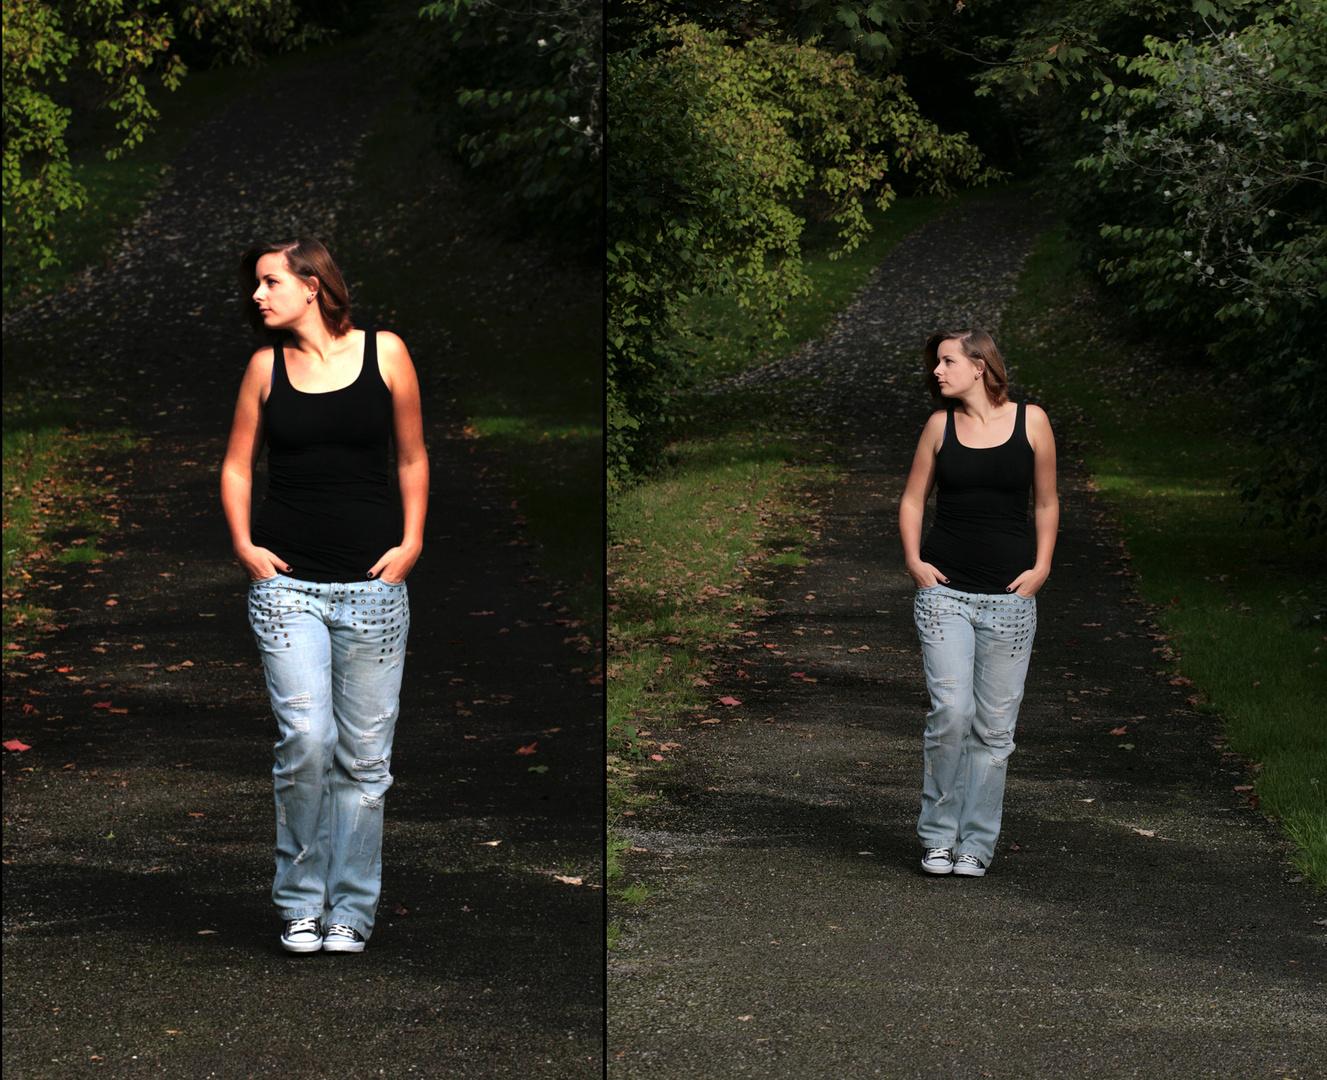 Catwalk - Pause